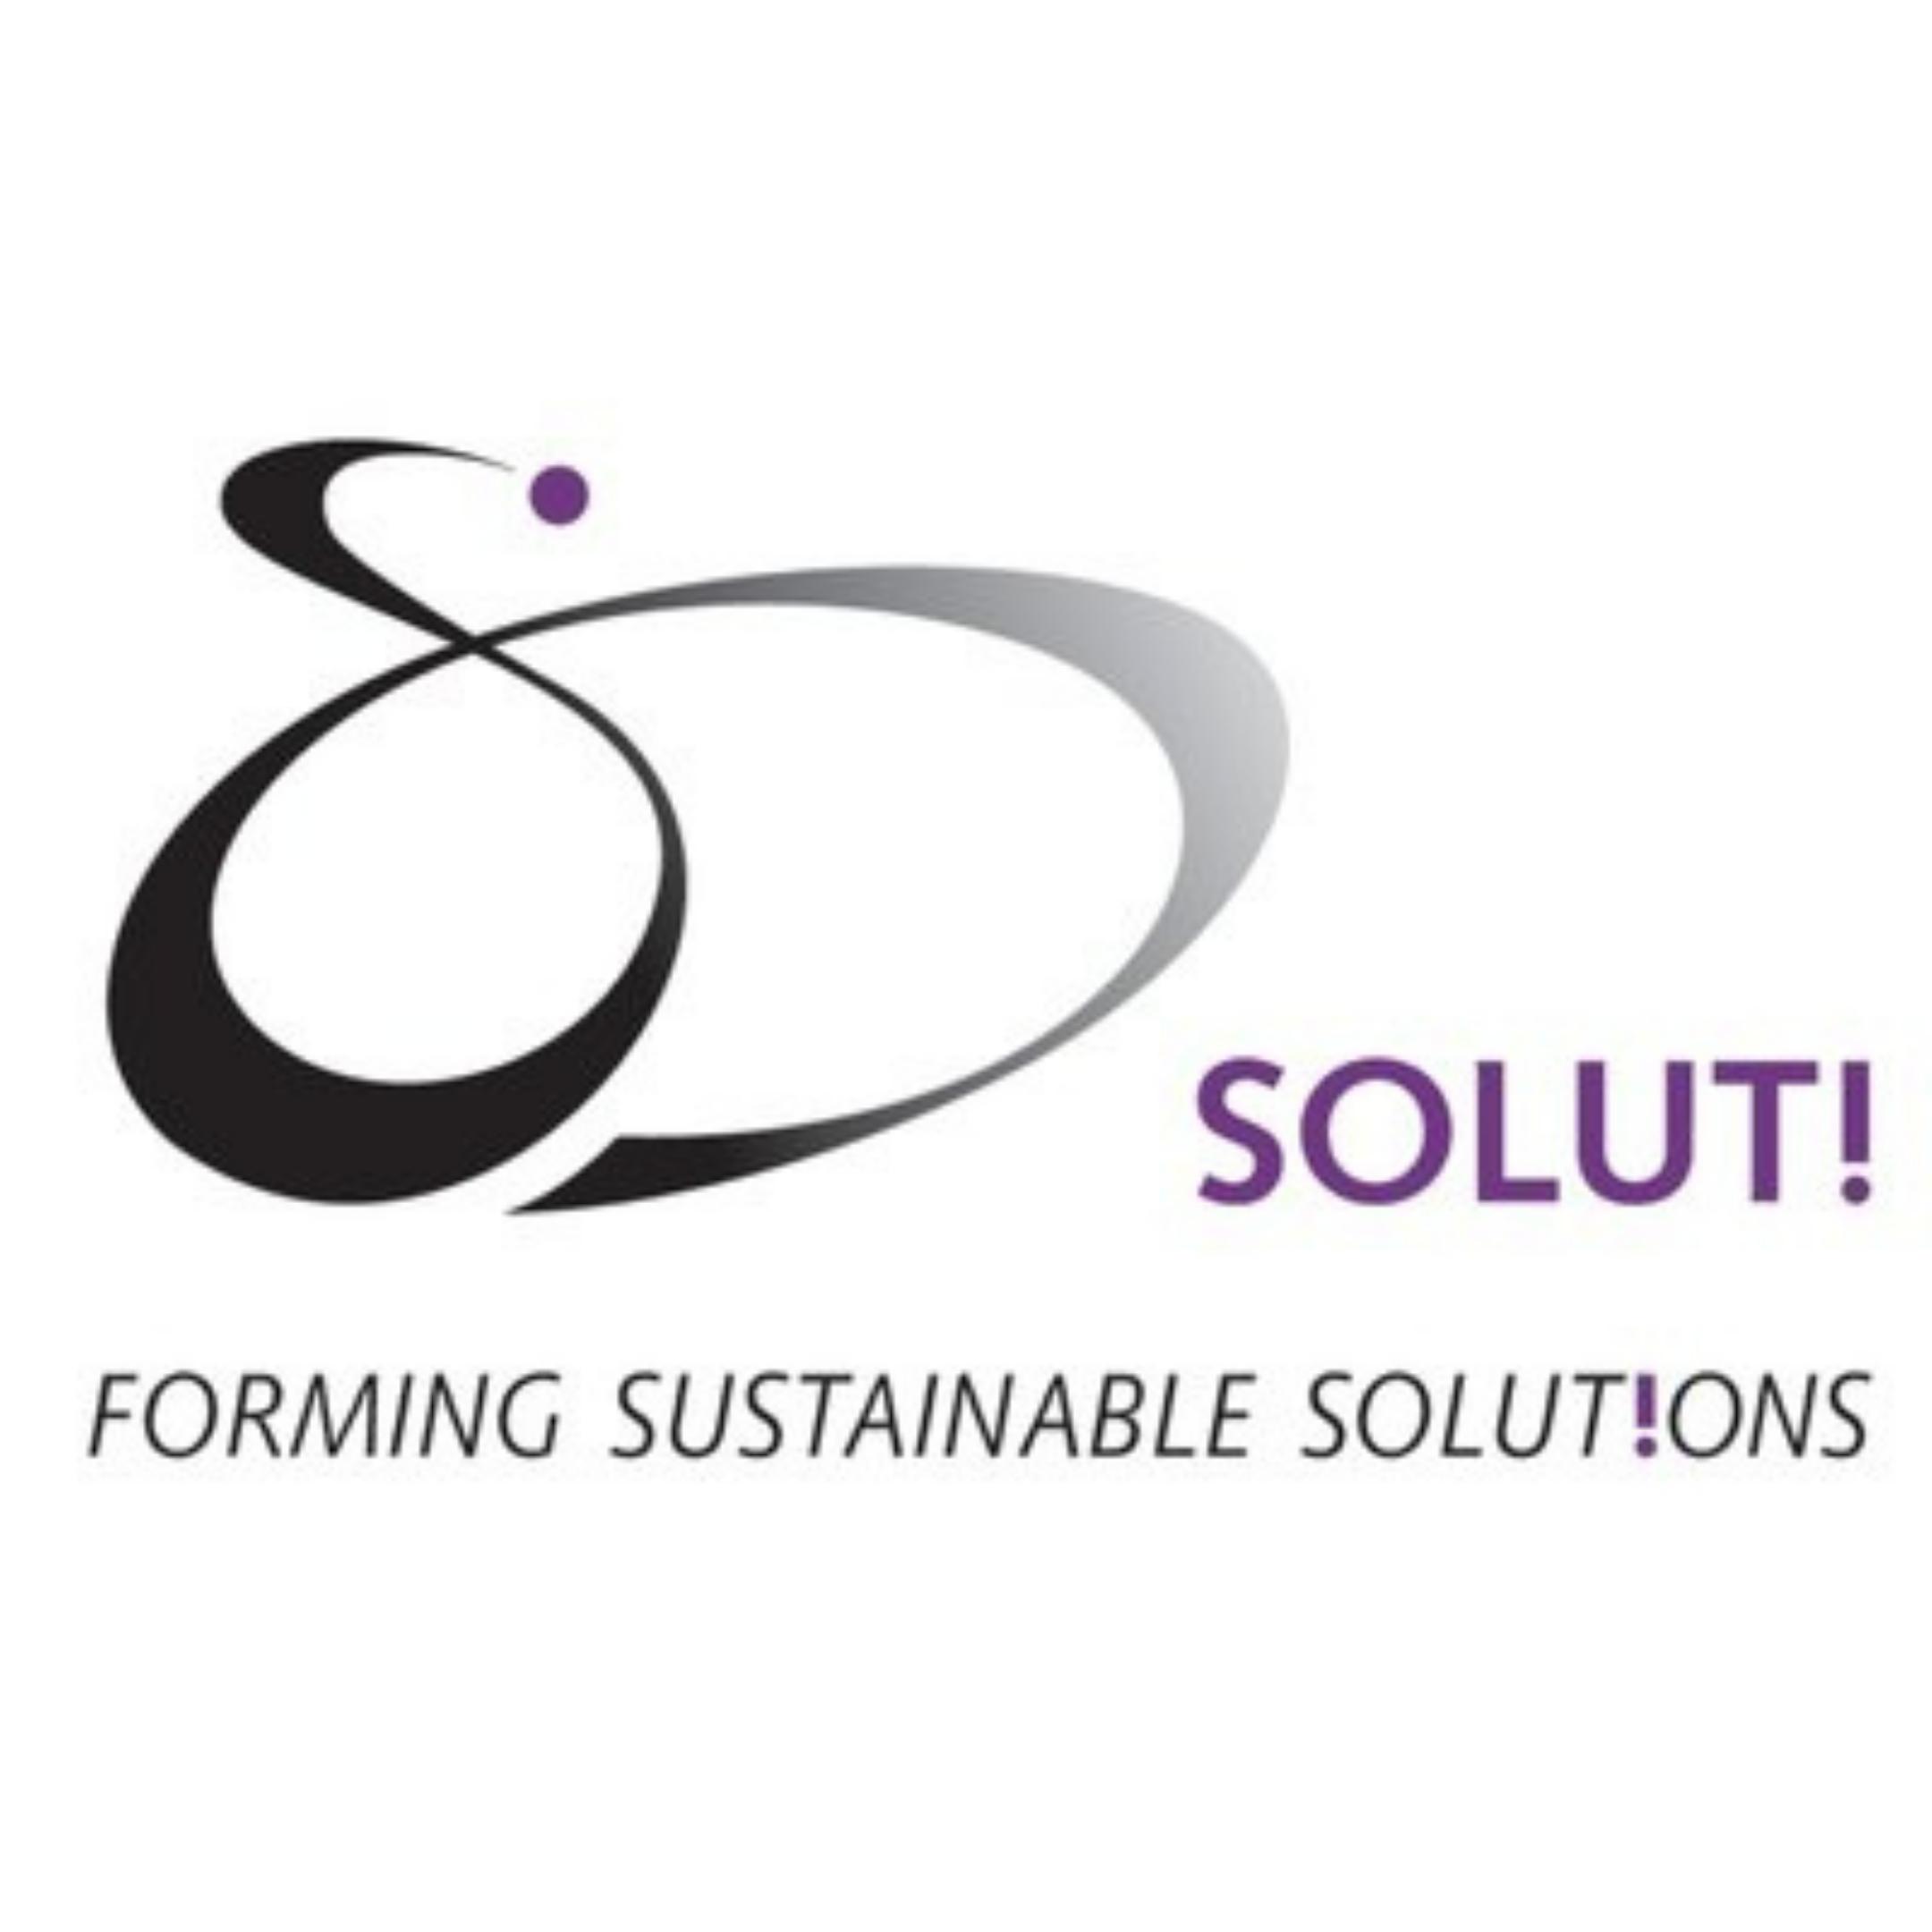 SOLUT! Logo